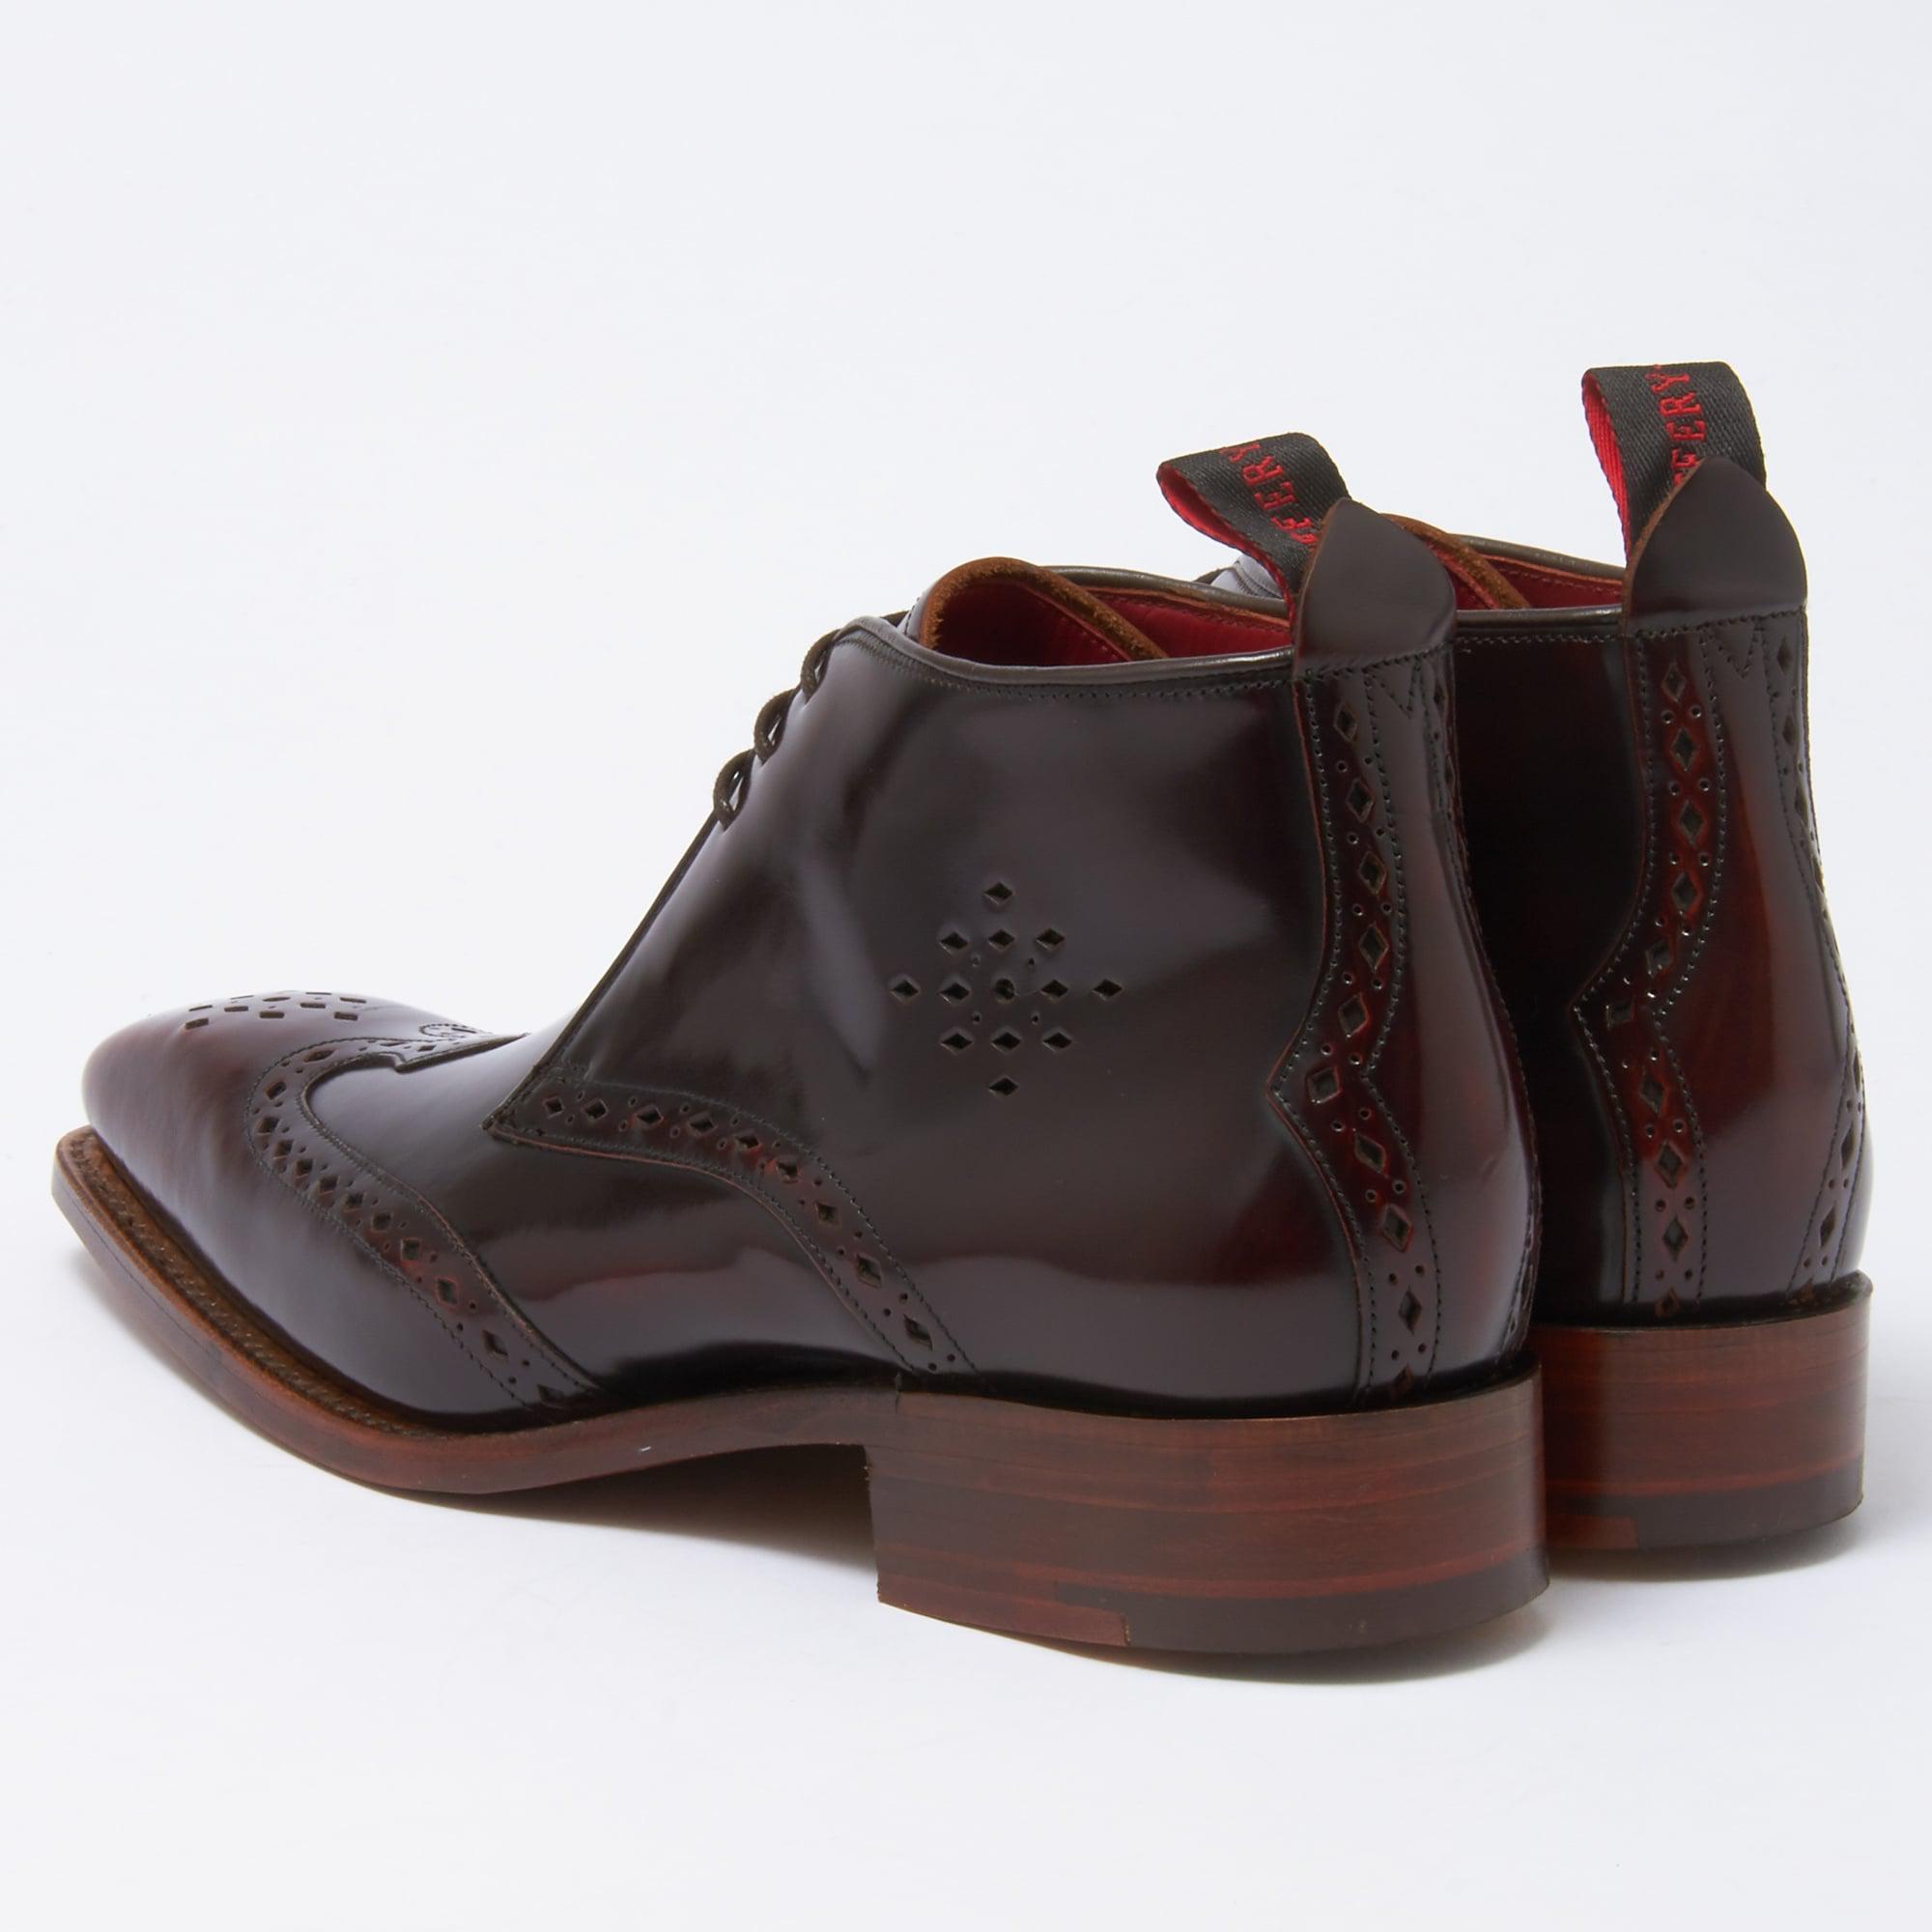 John White Hardy Brogue Shoes Brown